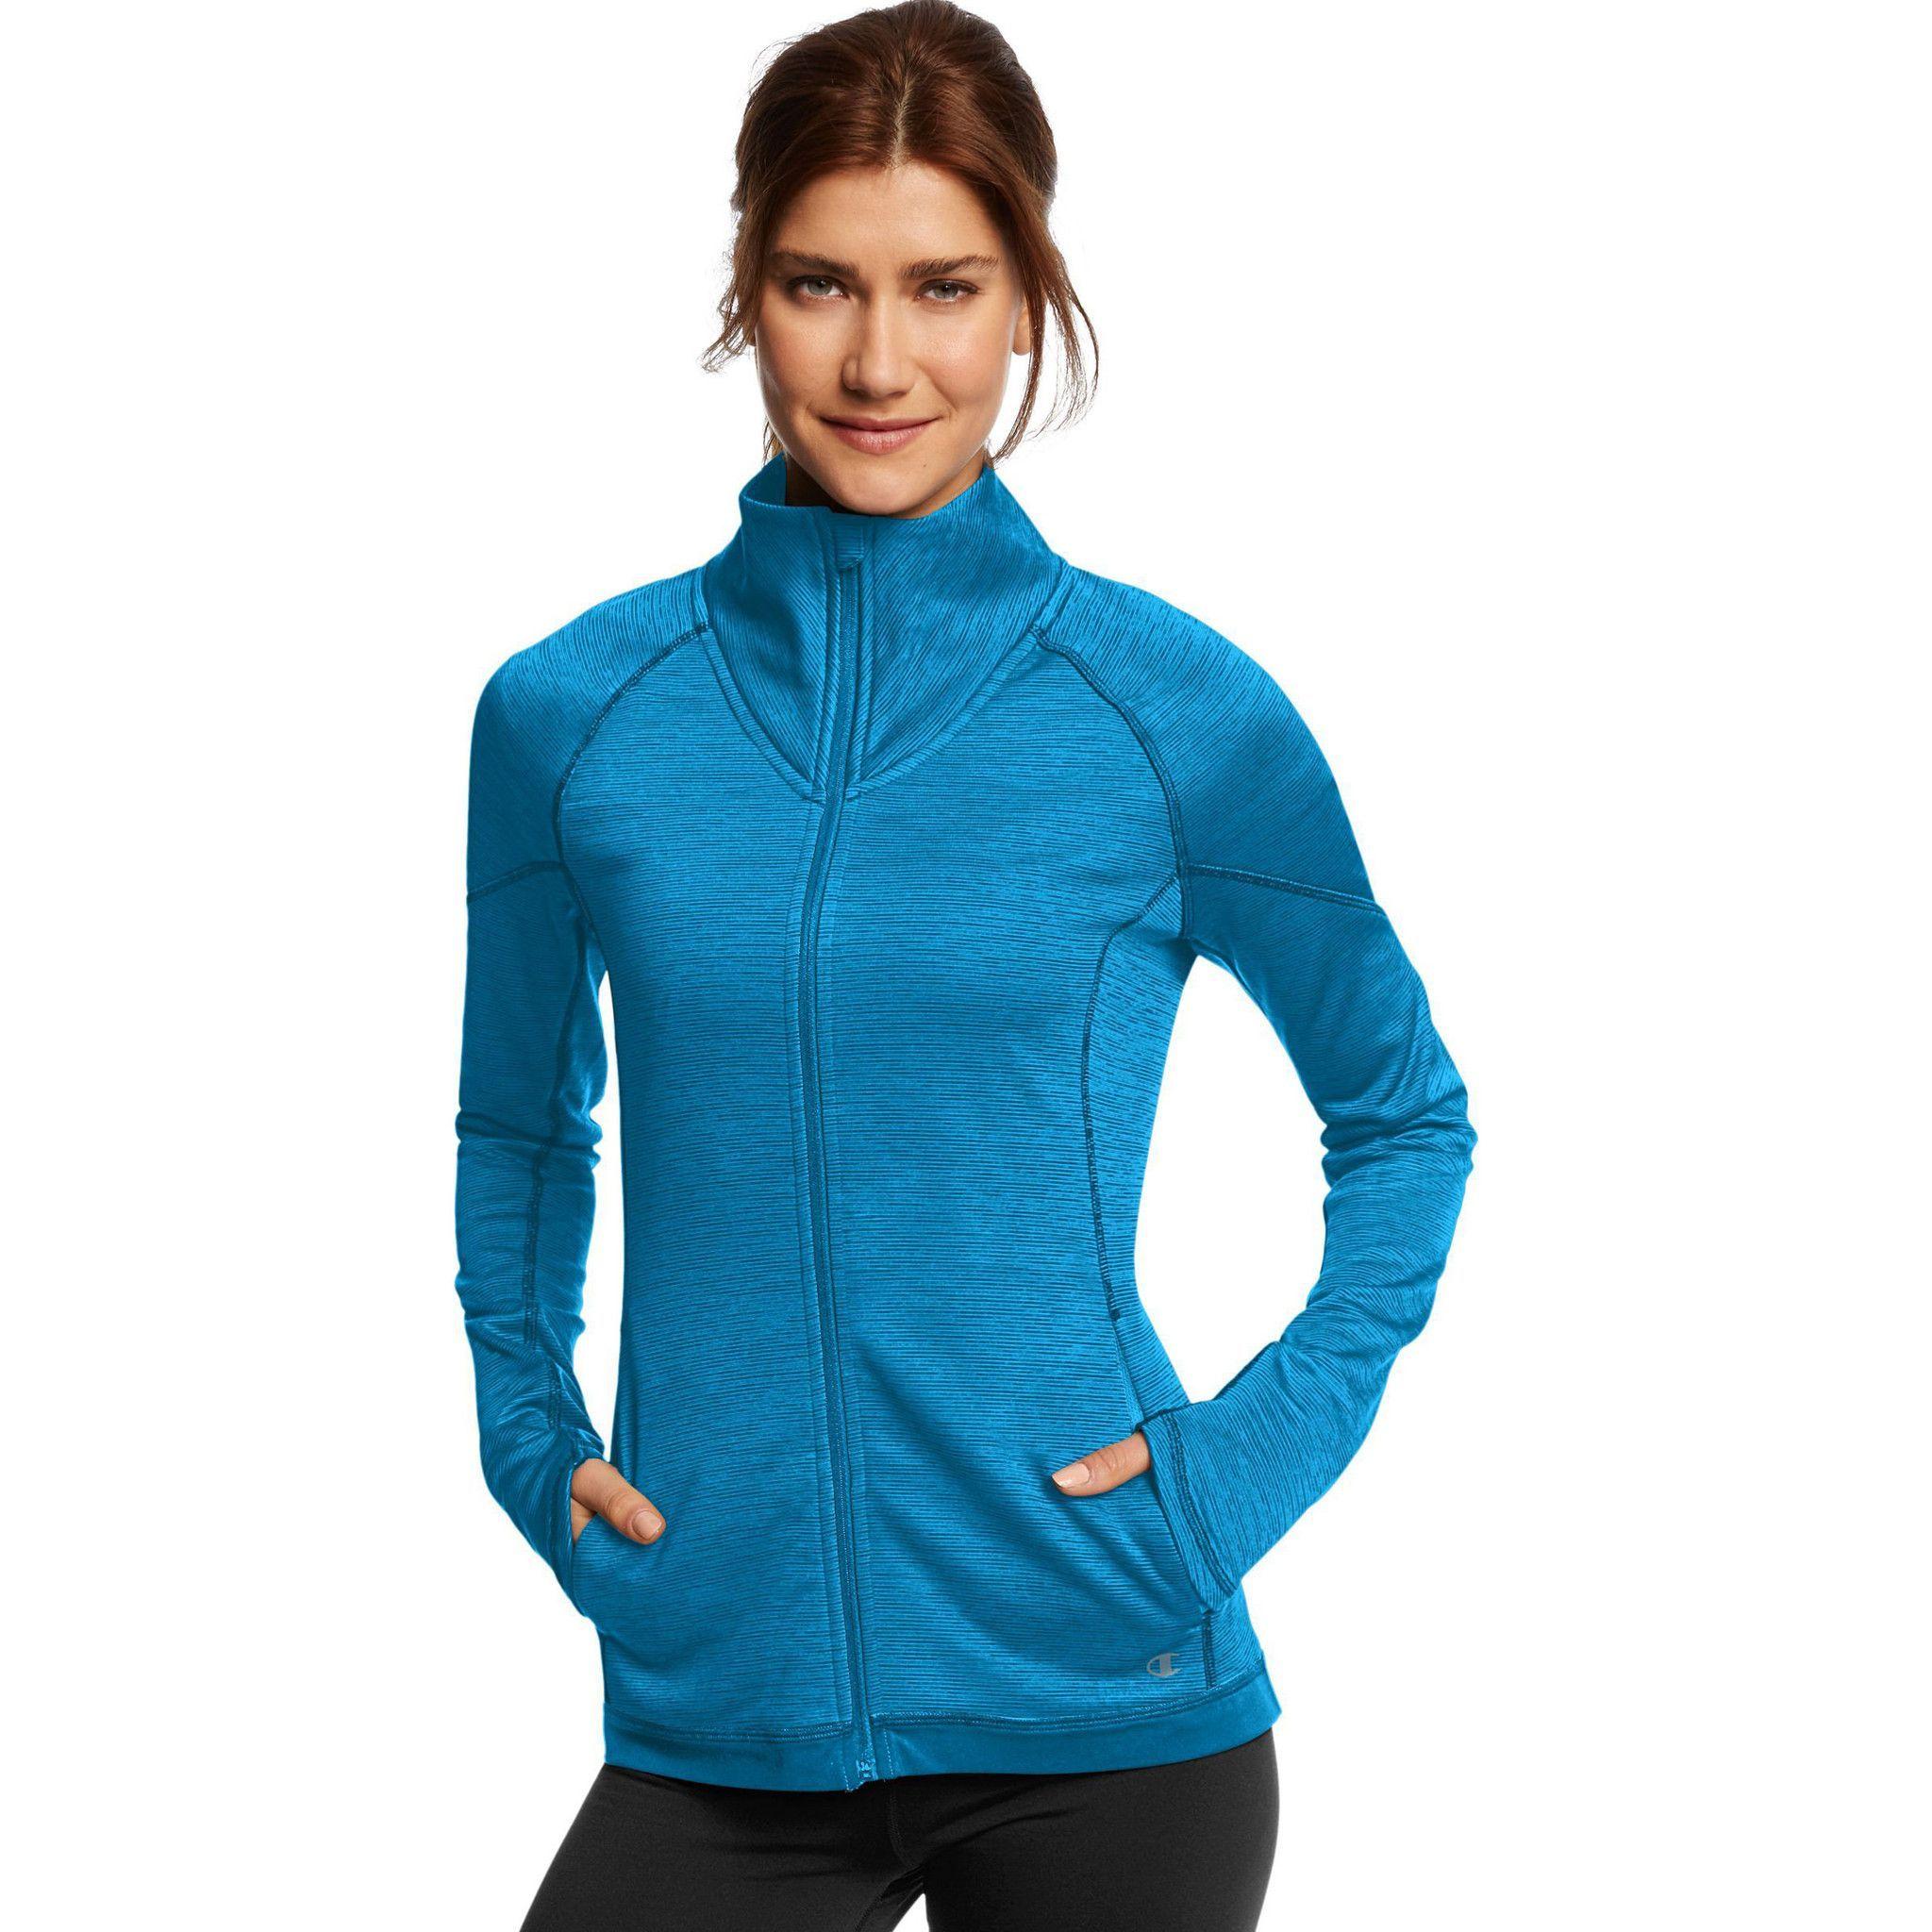 Champion Womens Tech Fleece Full Zip Jacket